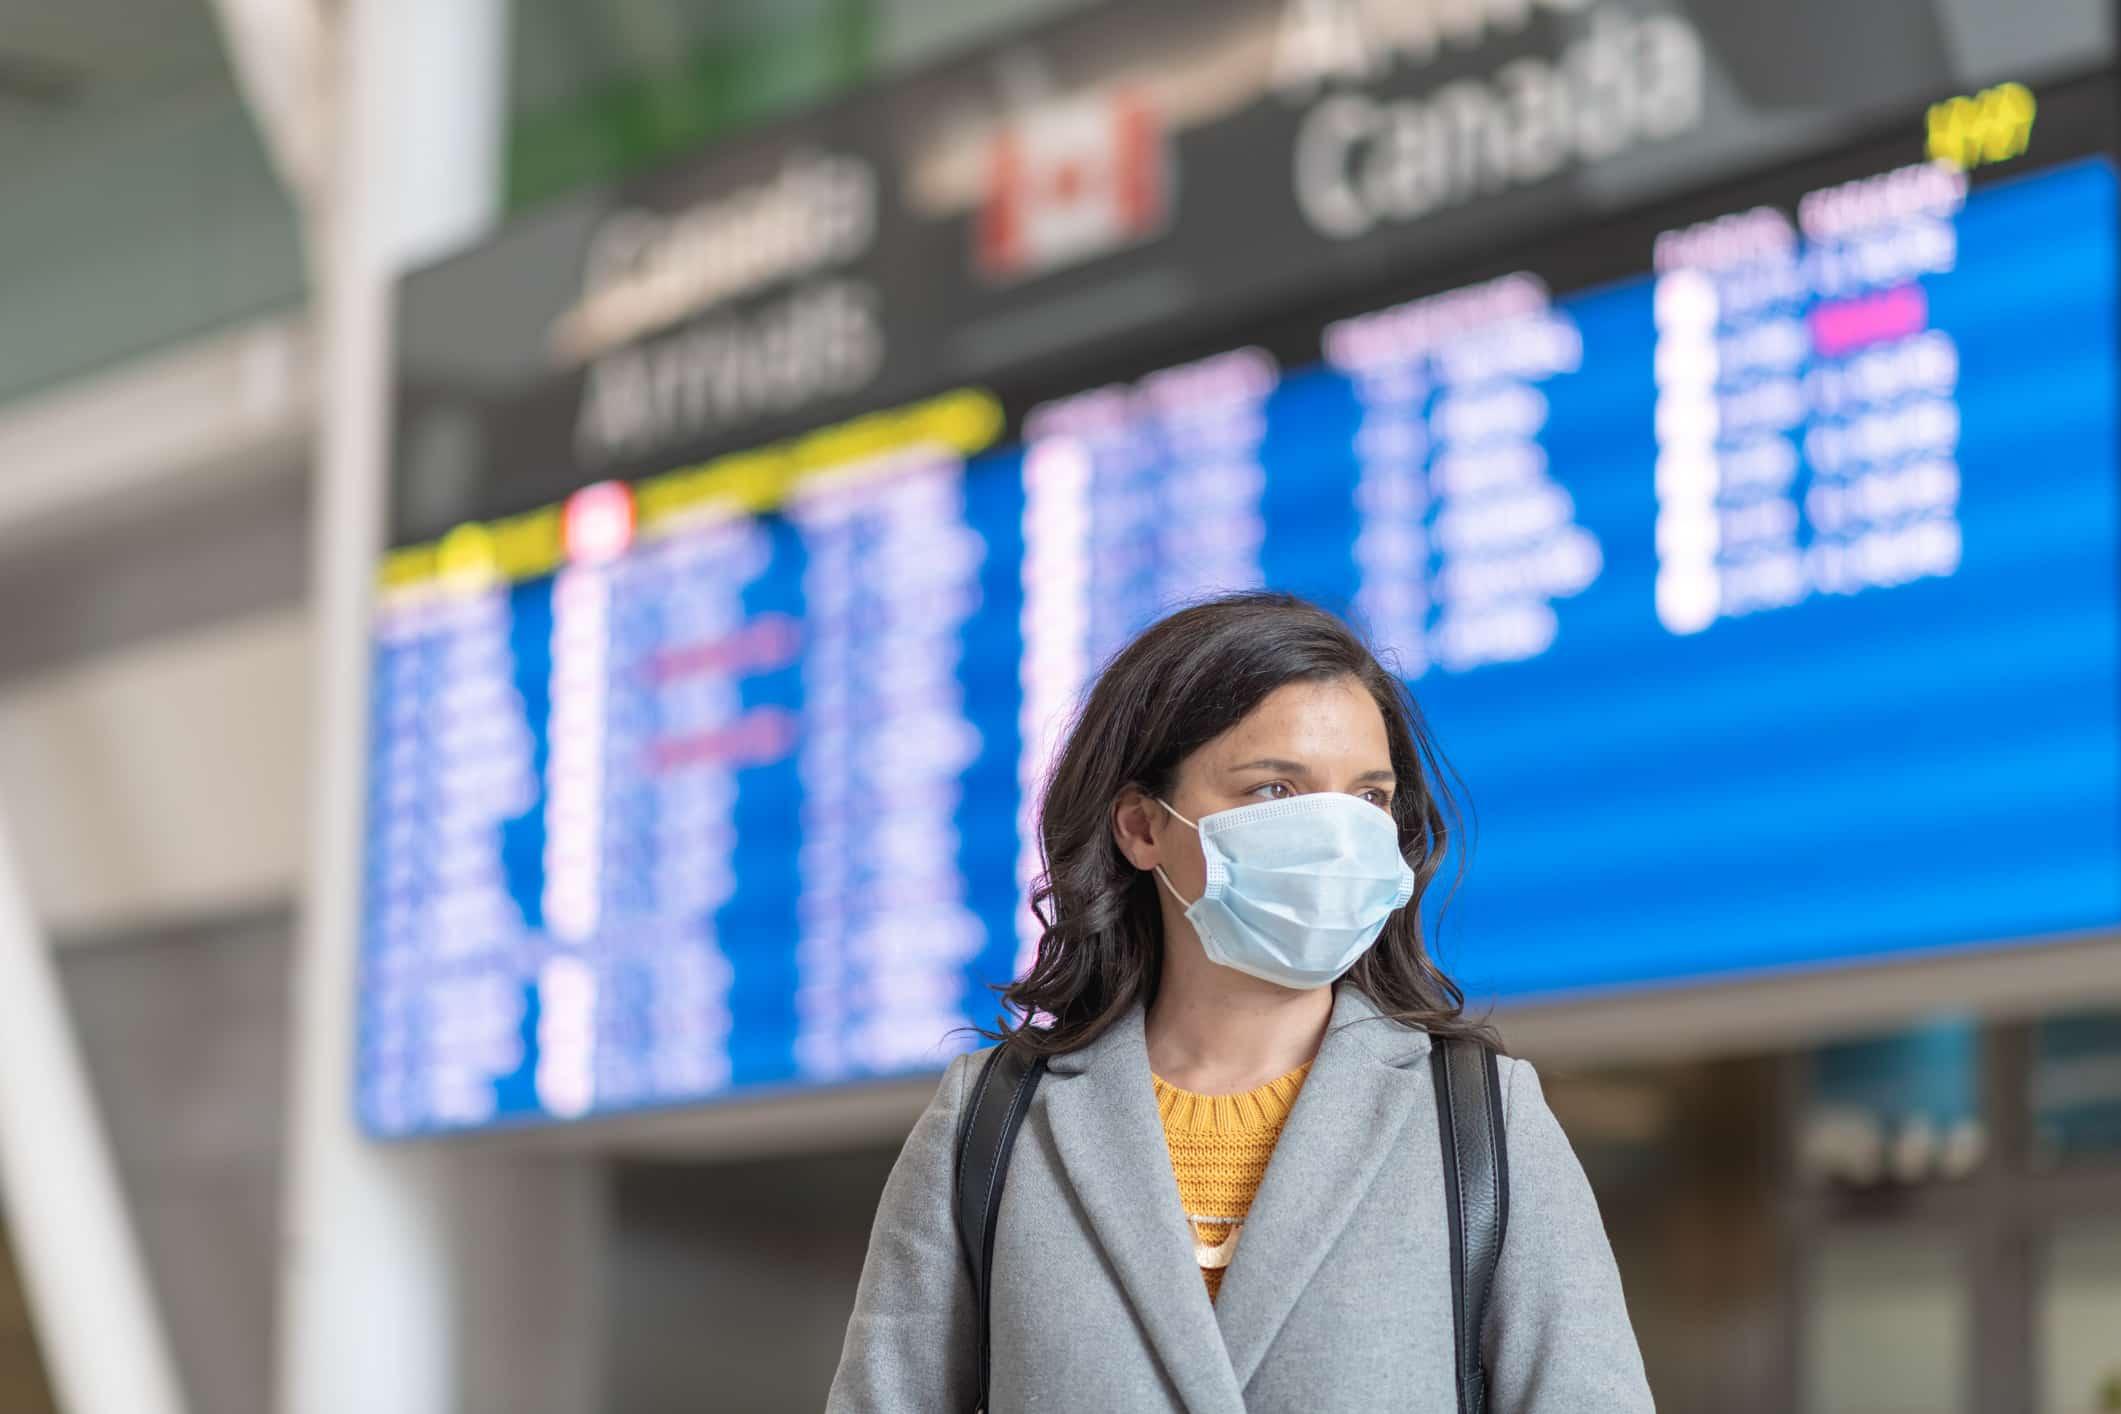 traveller at an airport